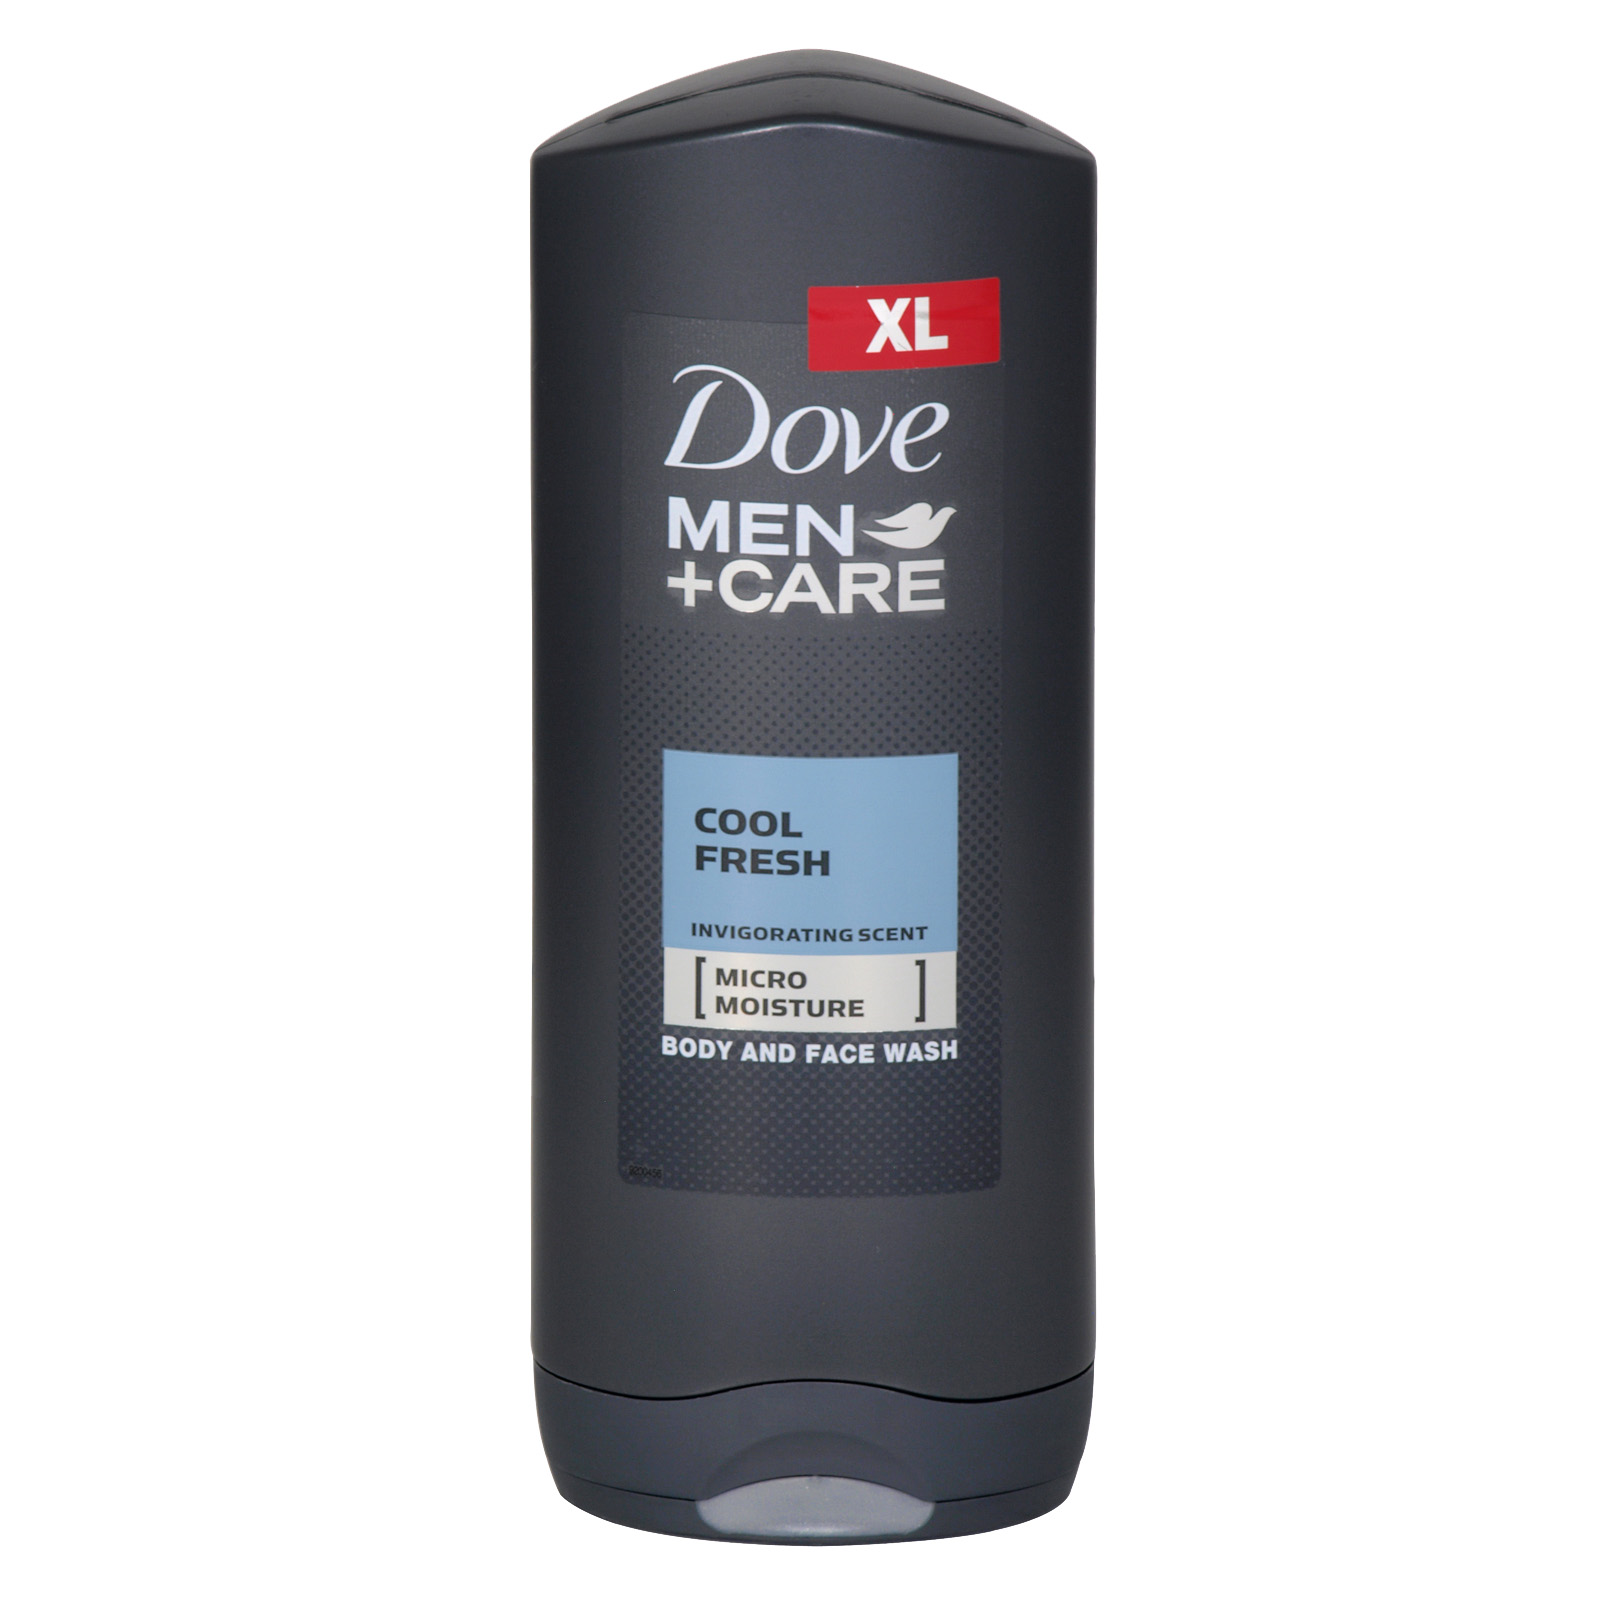 DOVE MEN+CARE 400ML FACE+BODY WASH COOL FRESH X 6